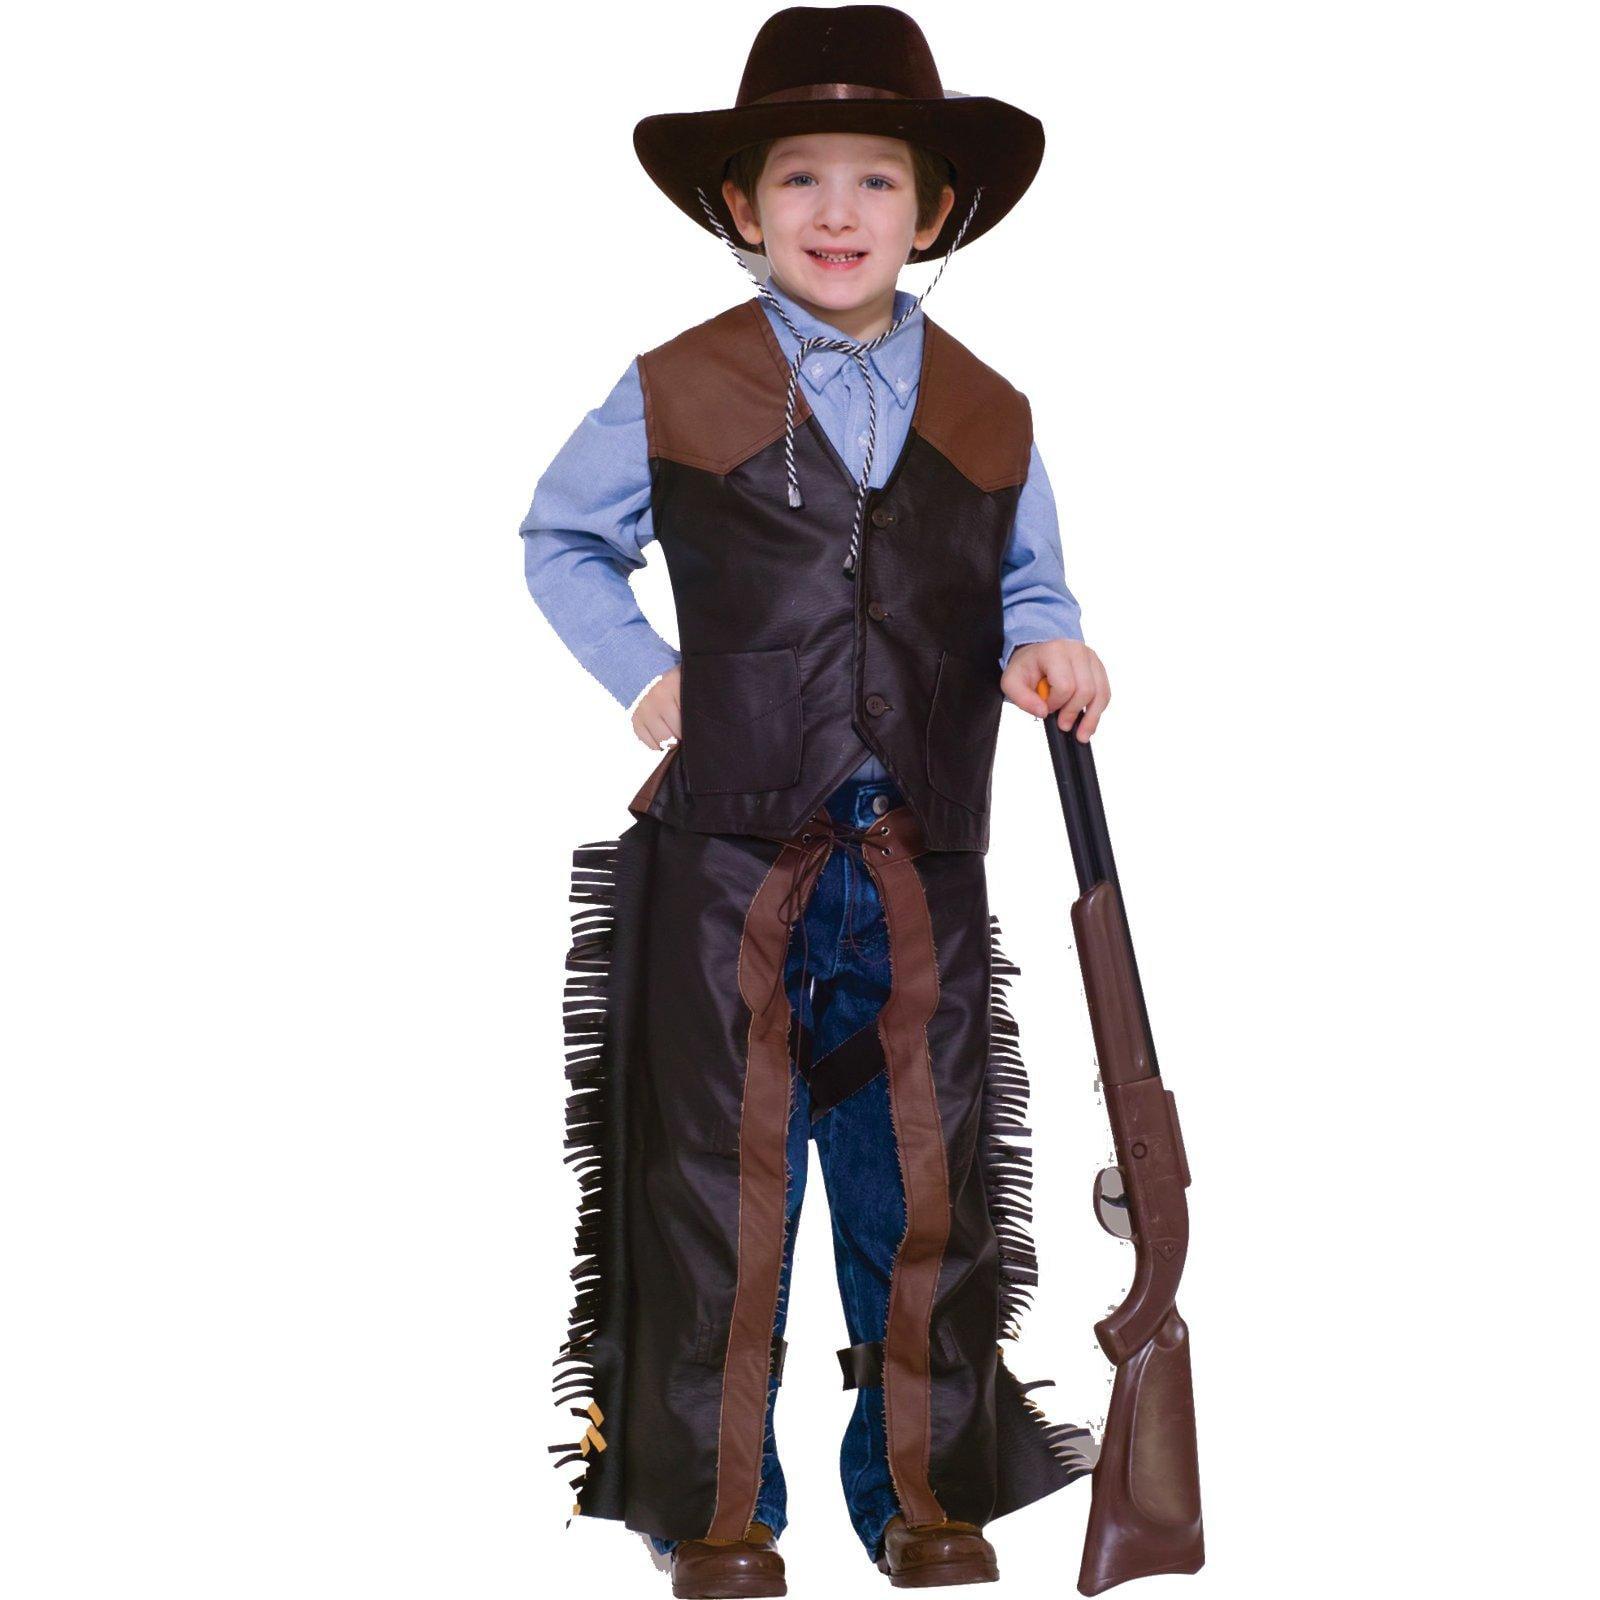 sc 1 st  Walmart & Dress-Up Cowboy Child Costume - Walmart.com